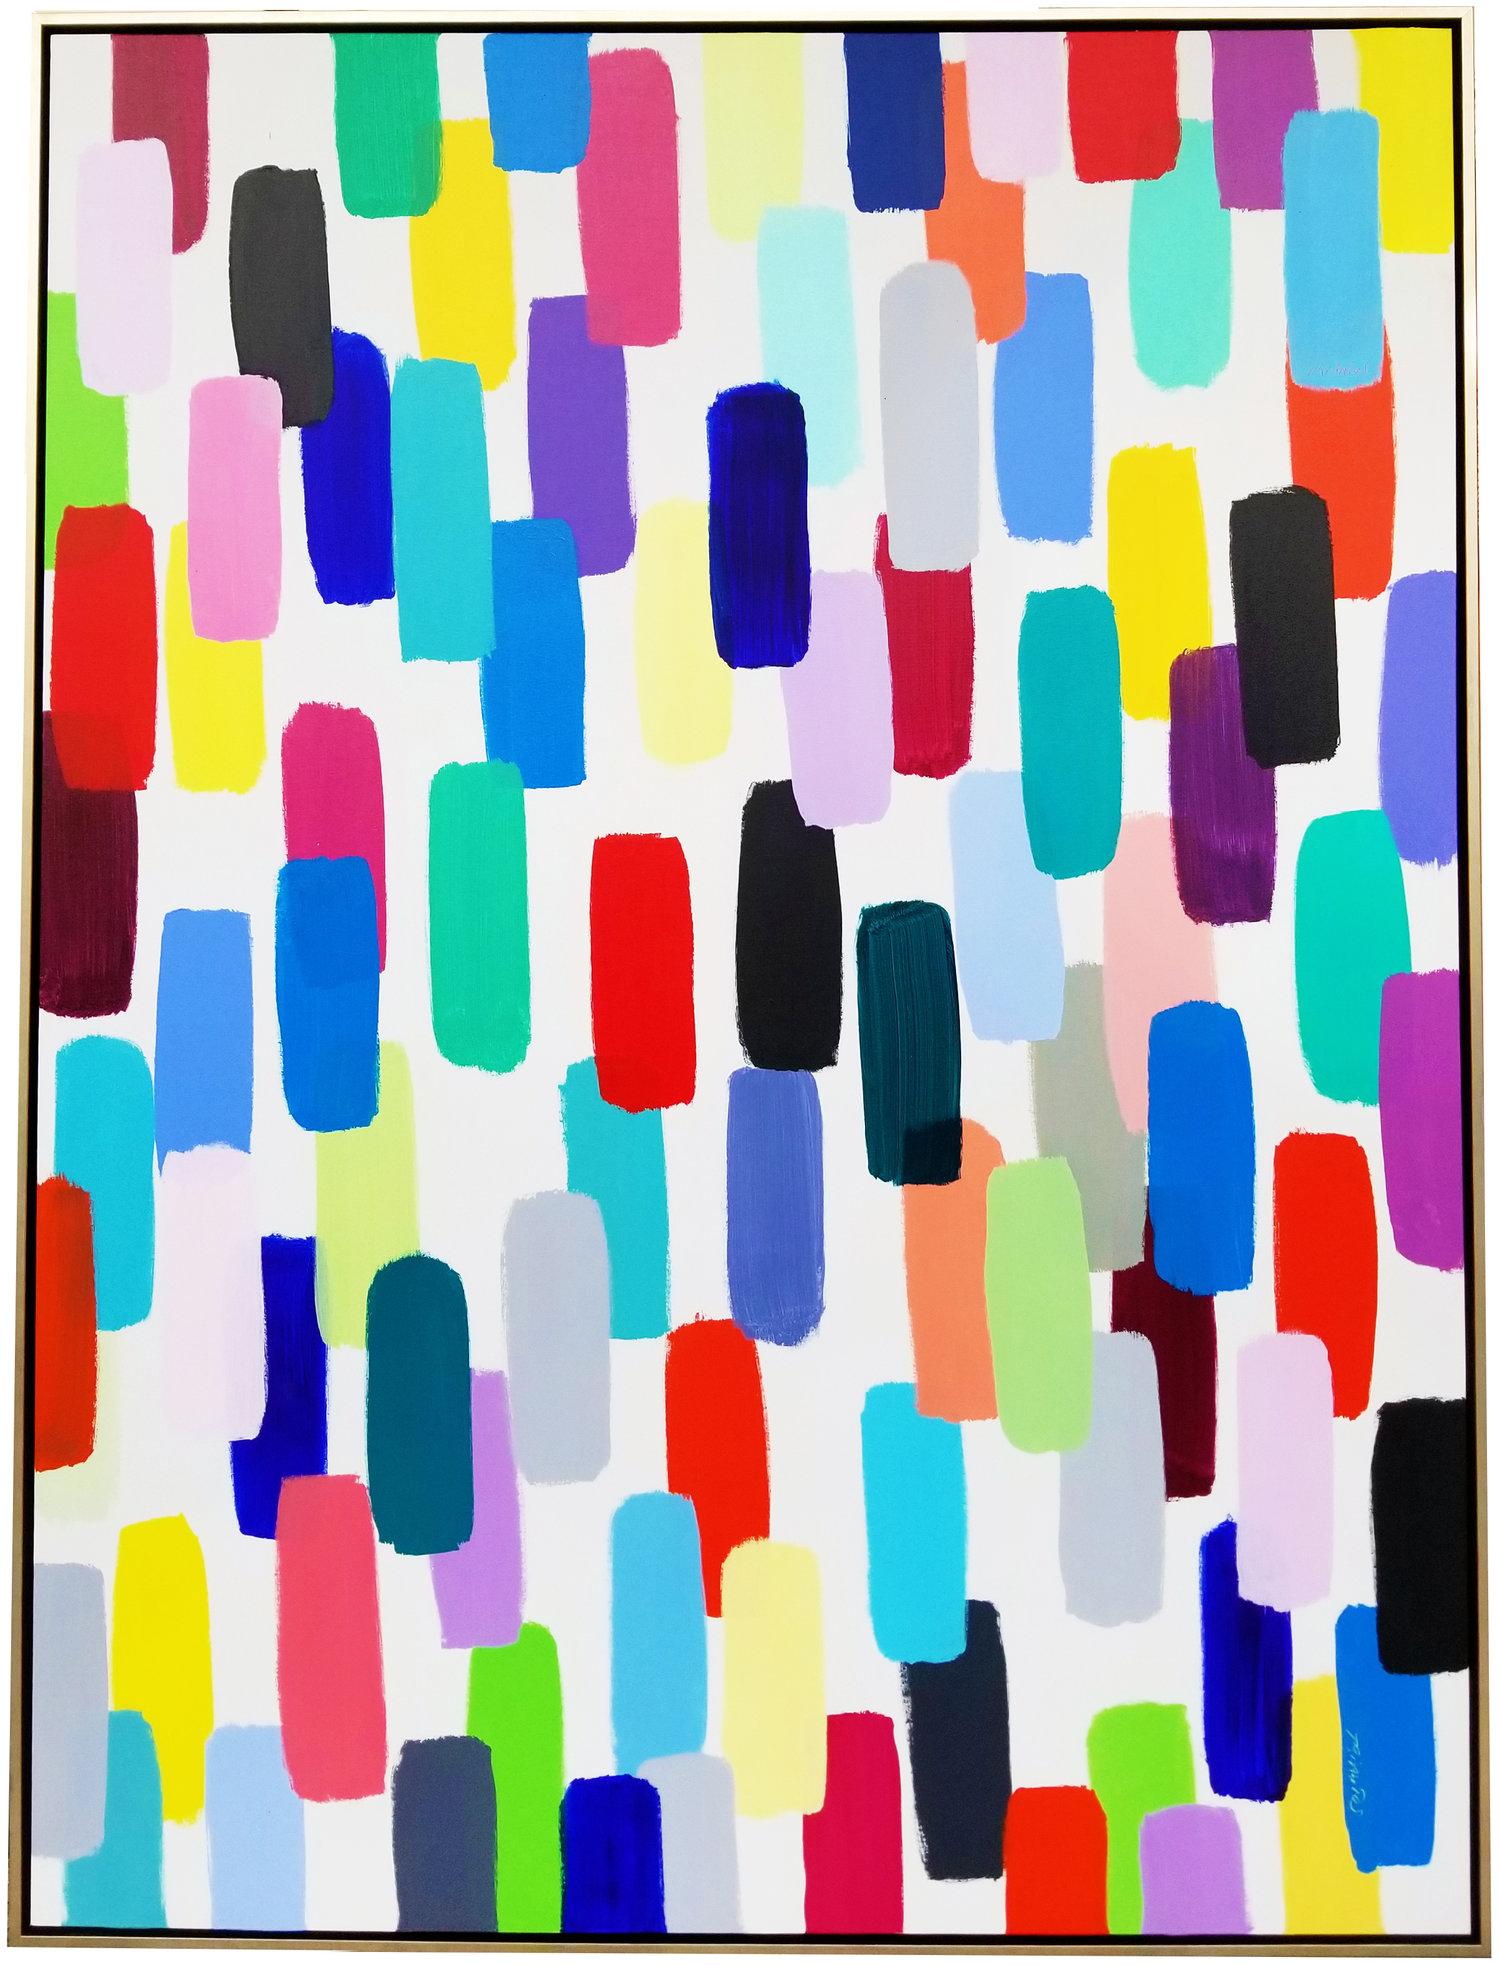 "Jelly Bean #38, 2017, acrylic on canvas, 72"" x 54"" (183 x 137 cm) in New York, USA"